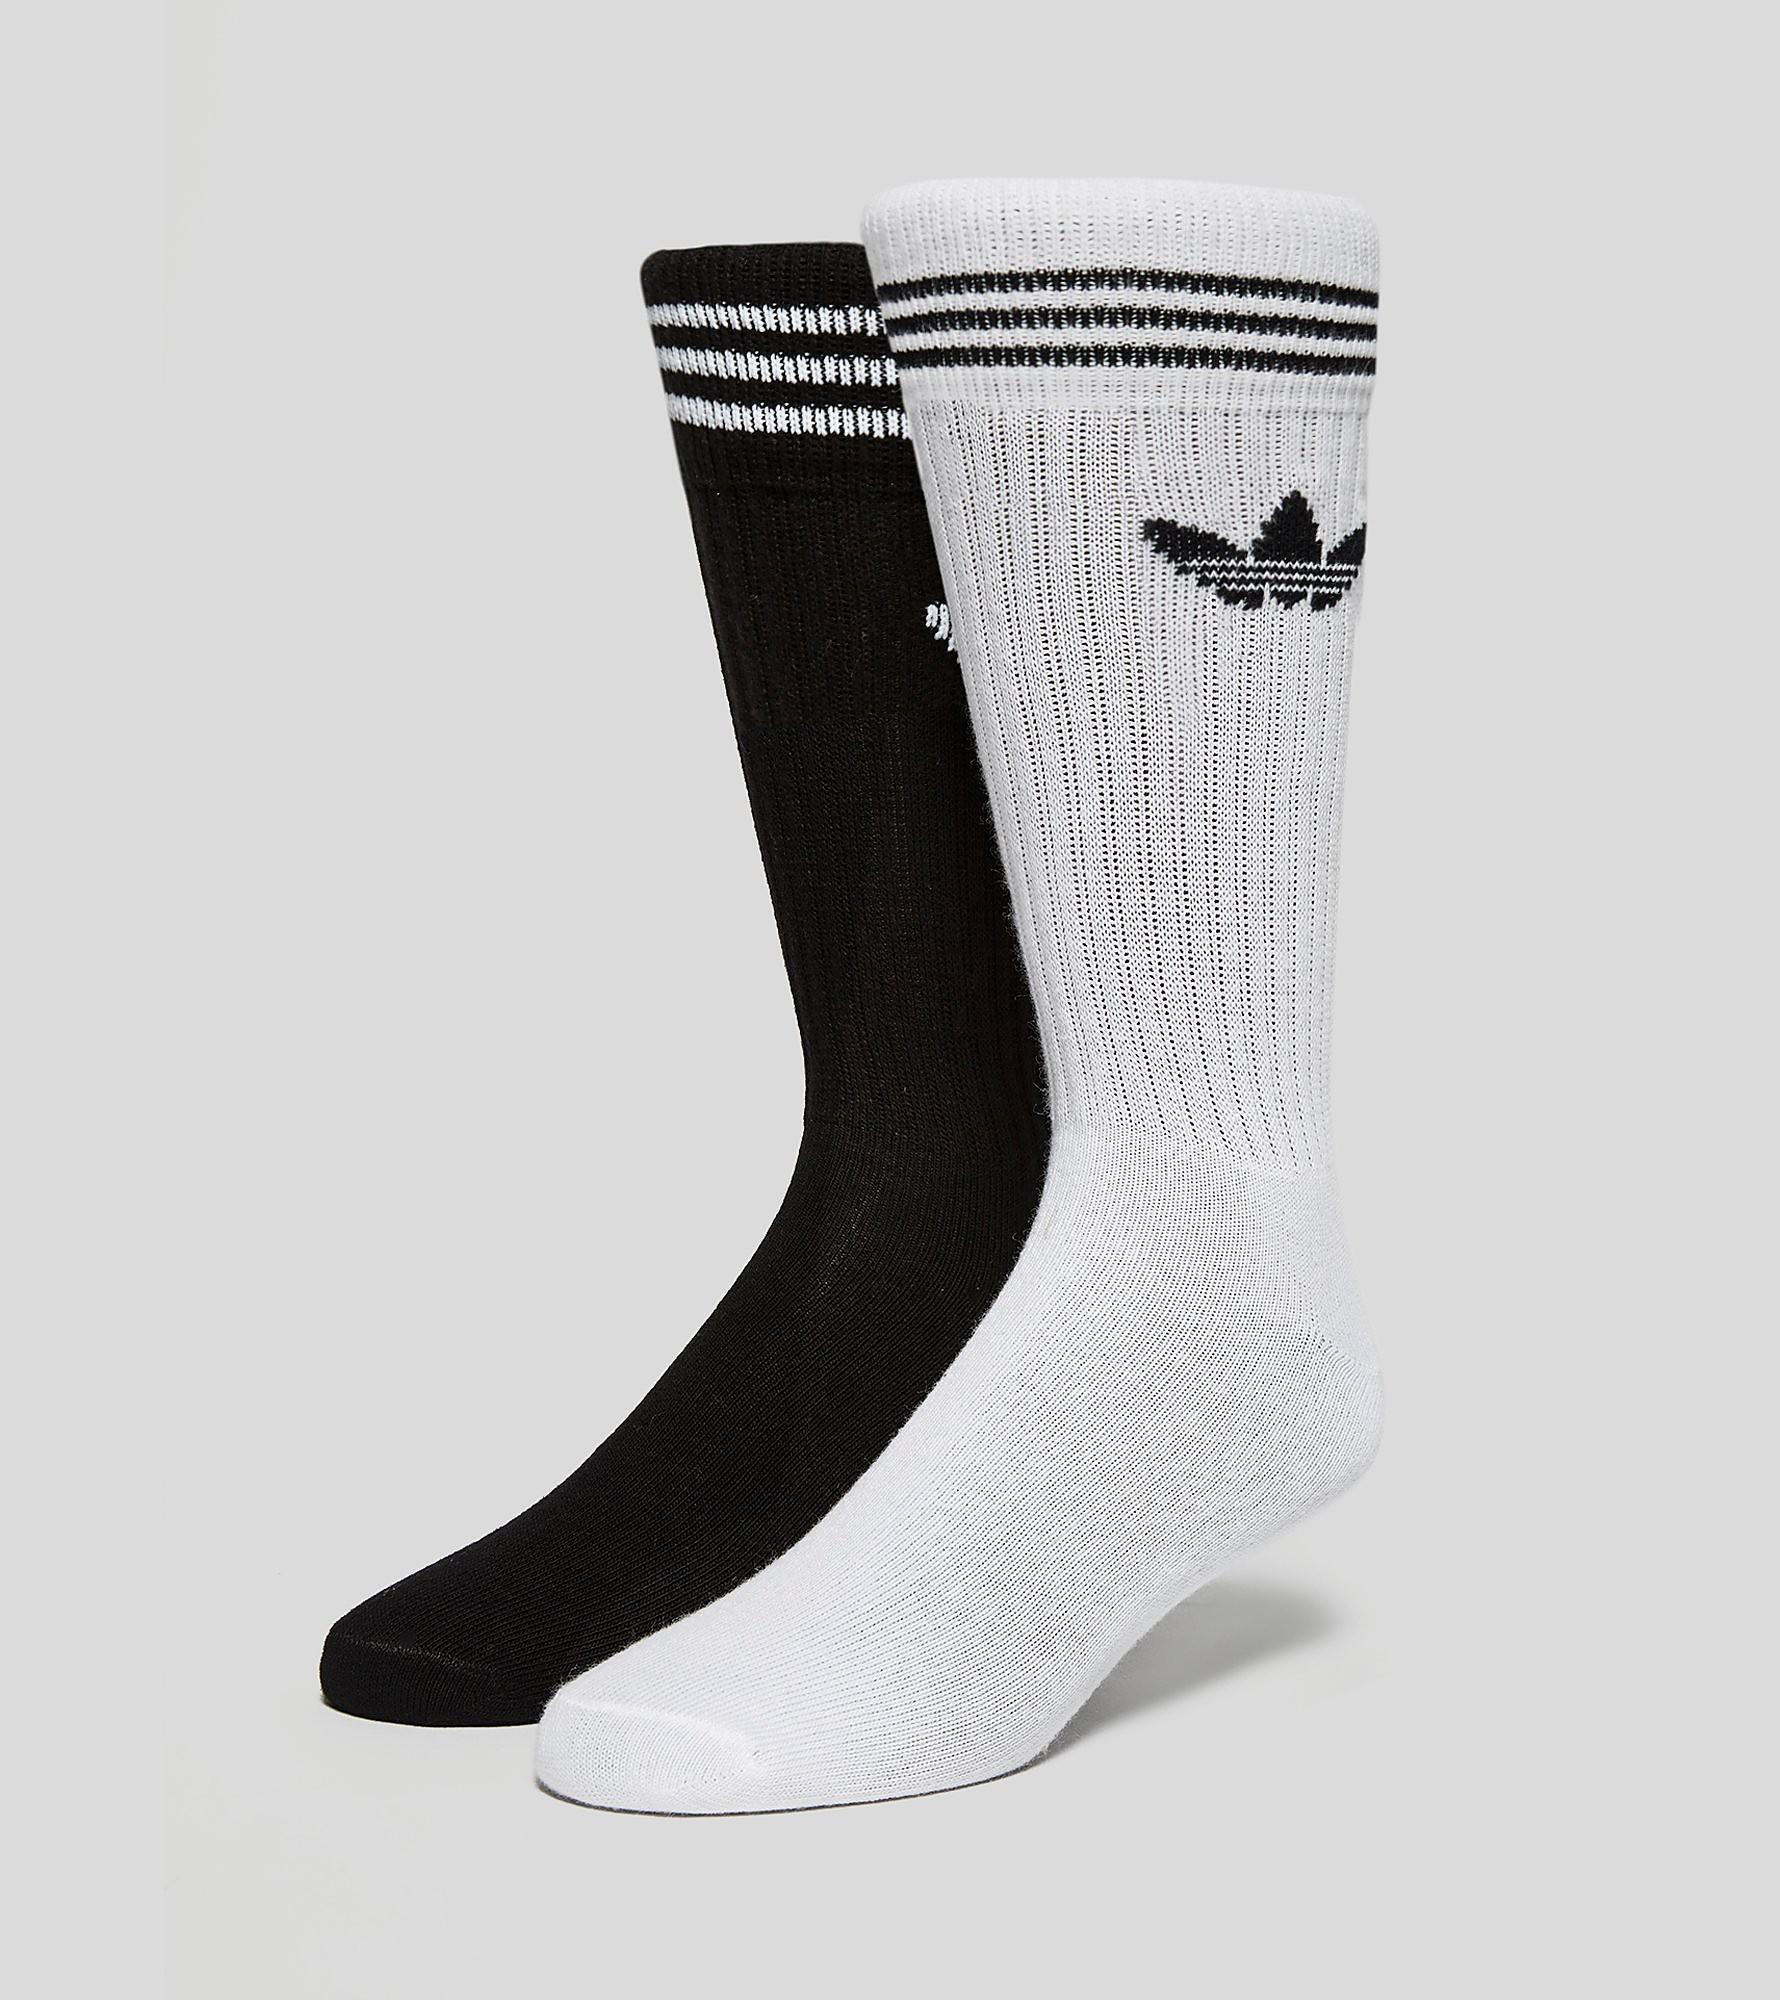 adidas Originals Two Pack Knee Socks